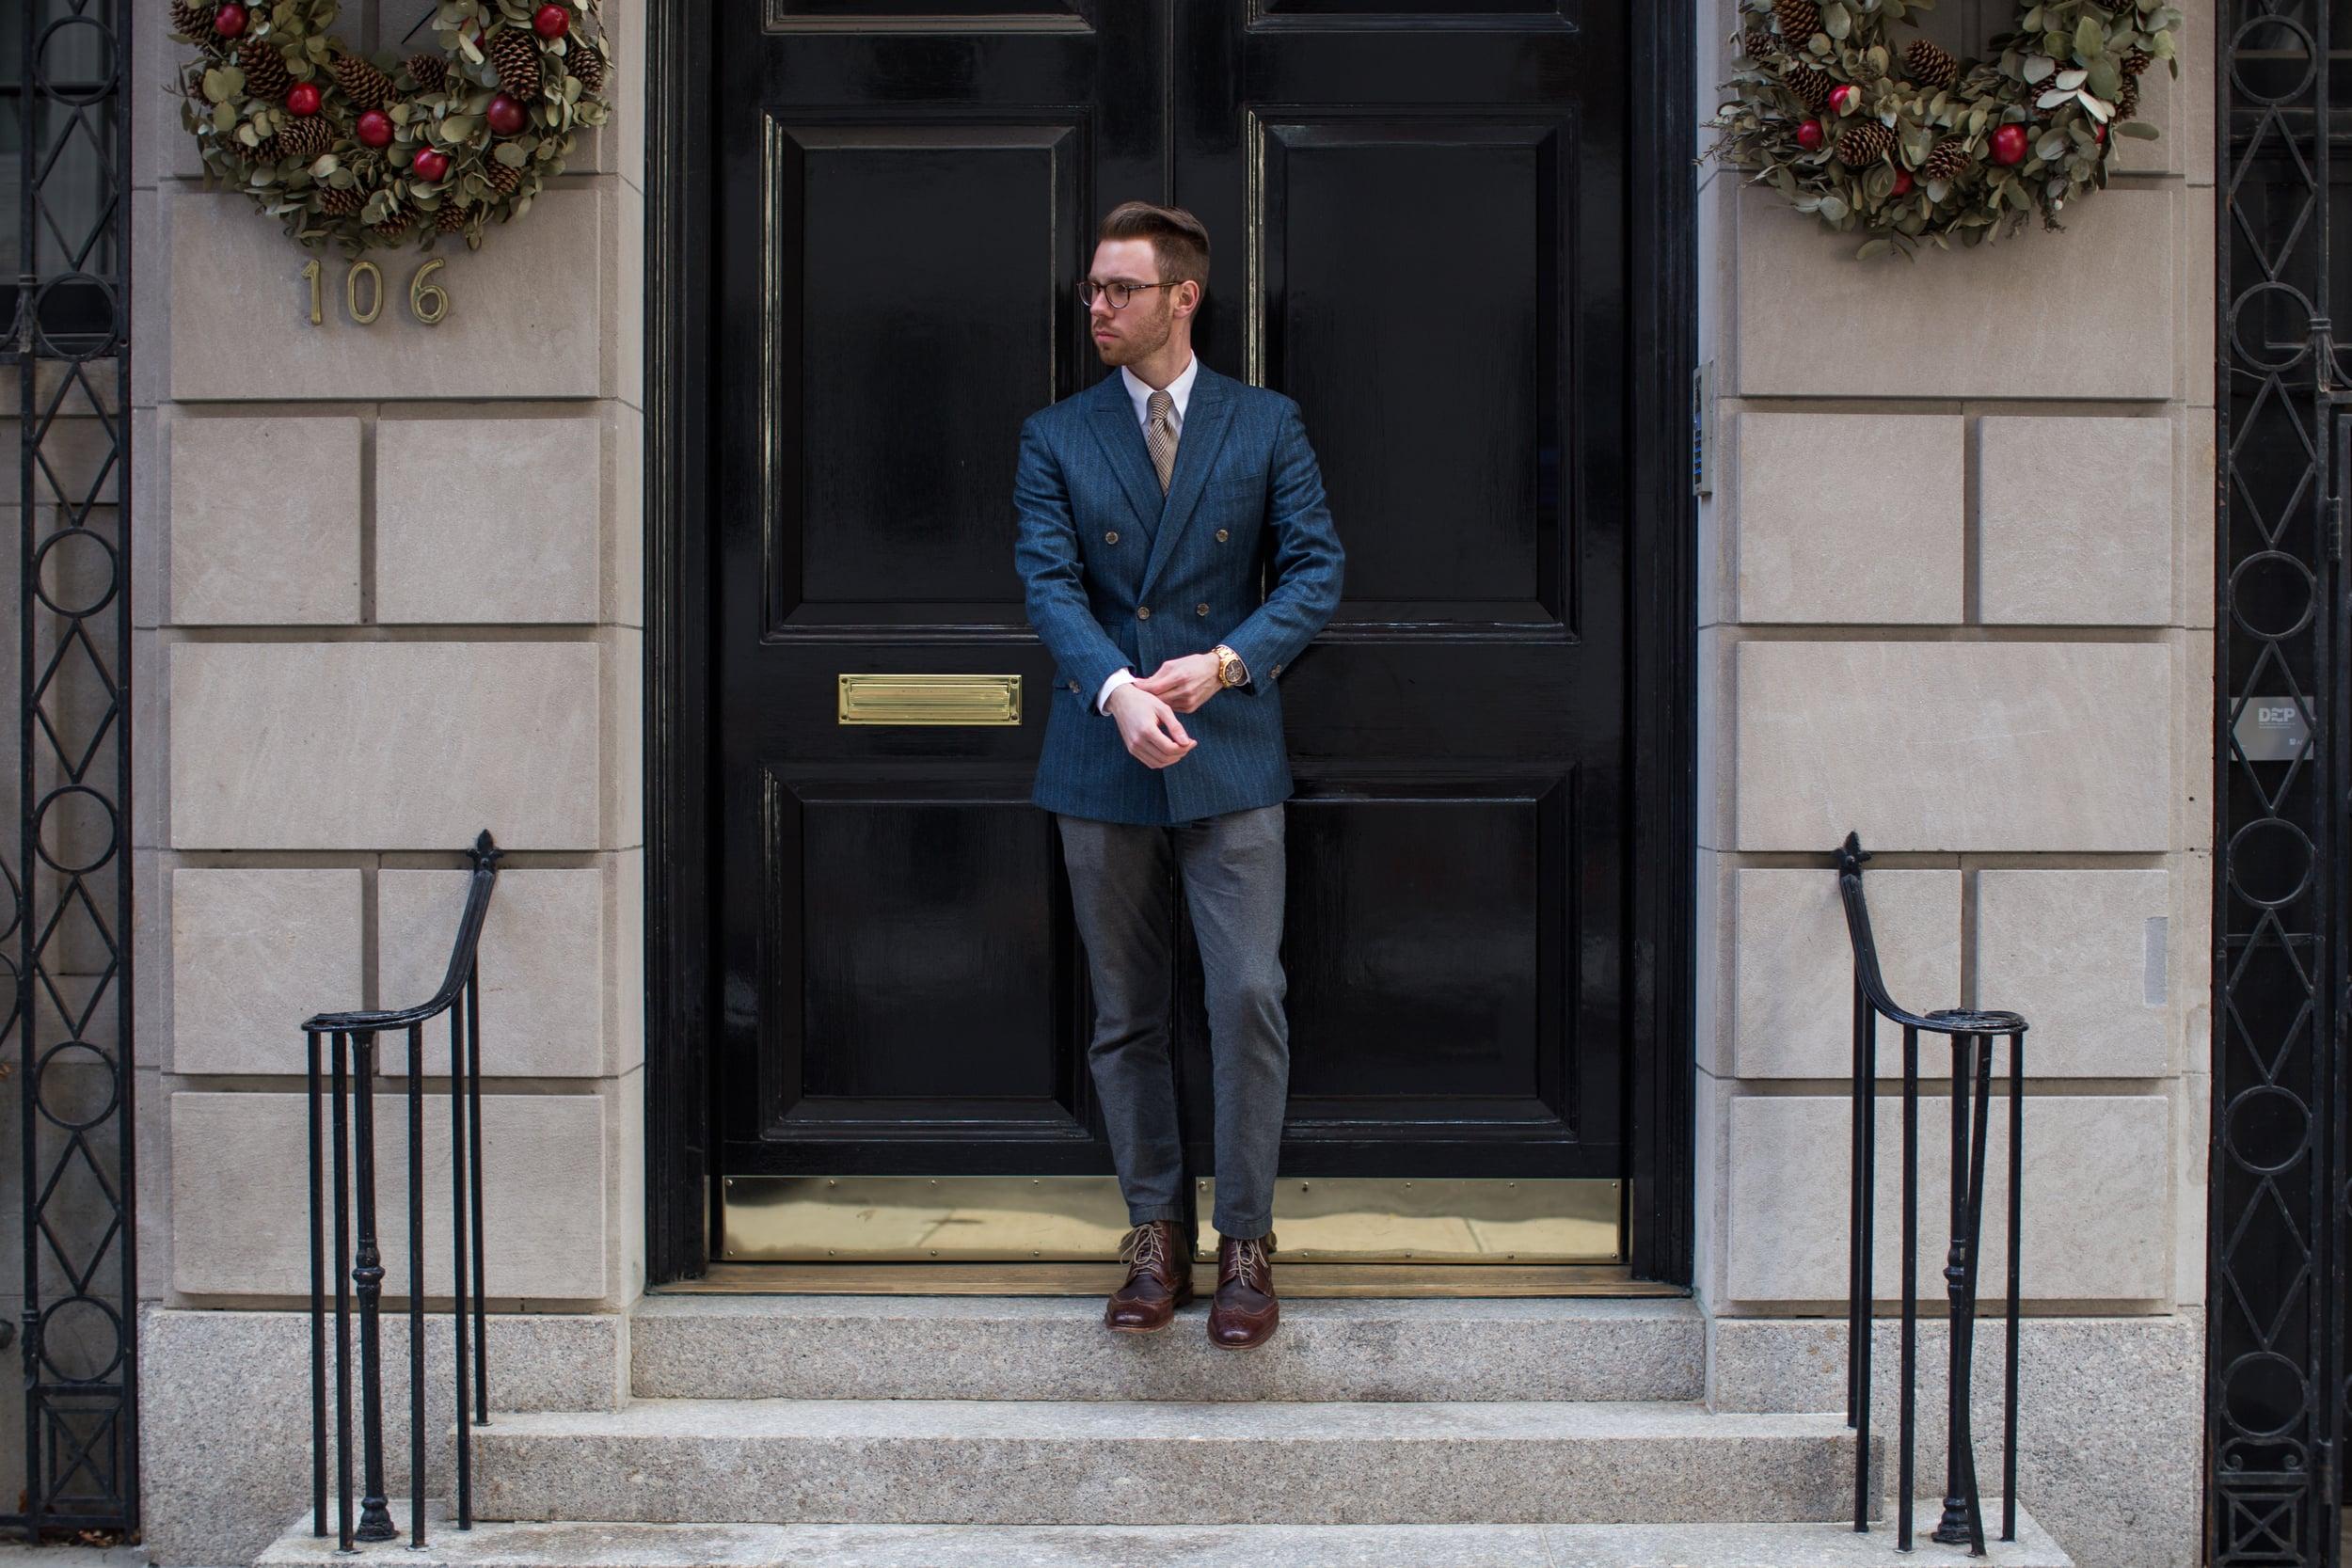 Blazer: Indochino, Pants: Brooks Brothers Red Fleece, Shirt: Brooks Brothers, Tie: Eddie Bauer(vintage), Boots: Johnston & Murphy, Glasses: Ralph Lauren, Watch: Victoninox